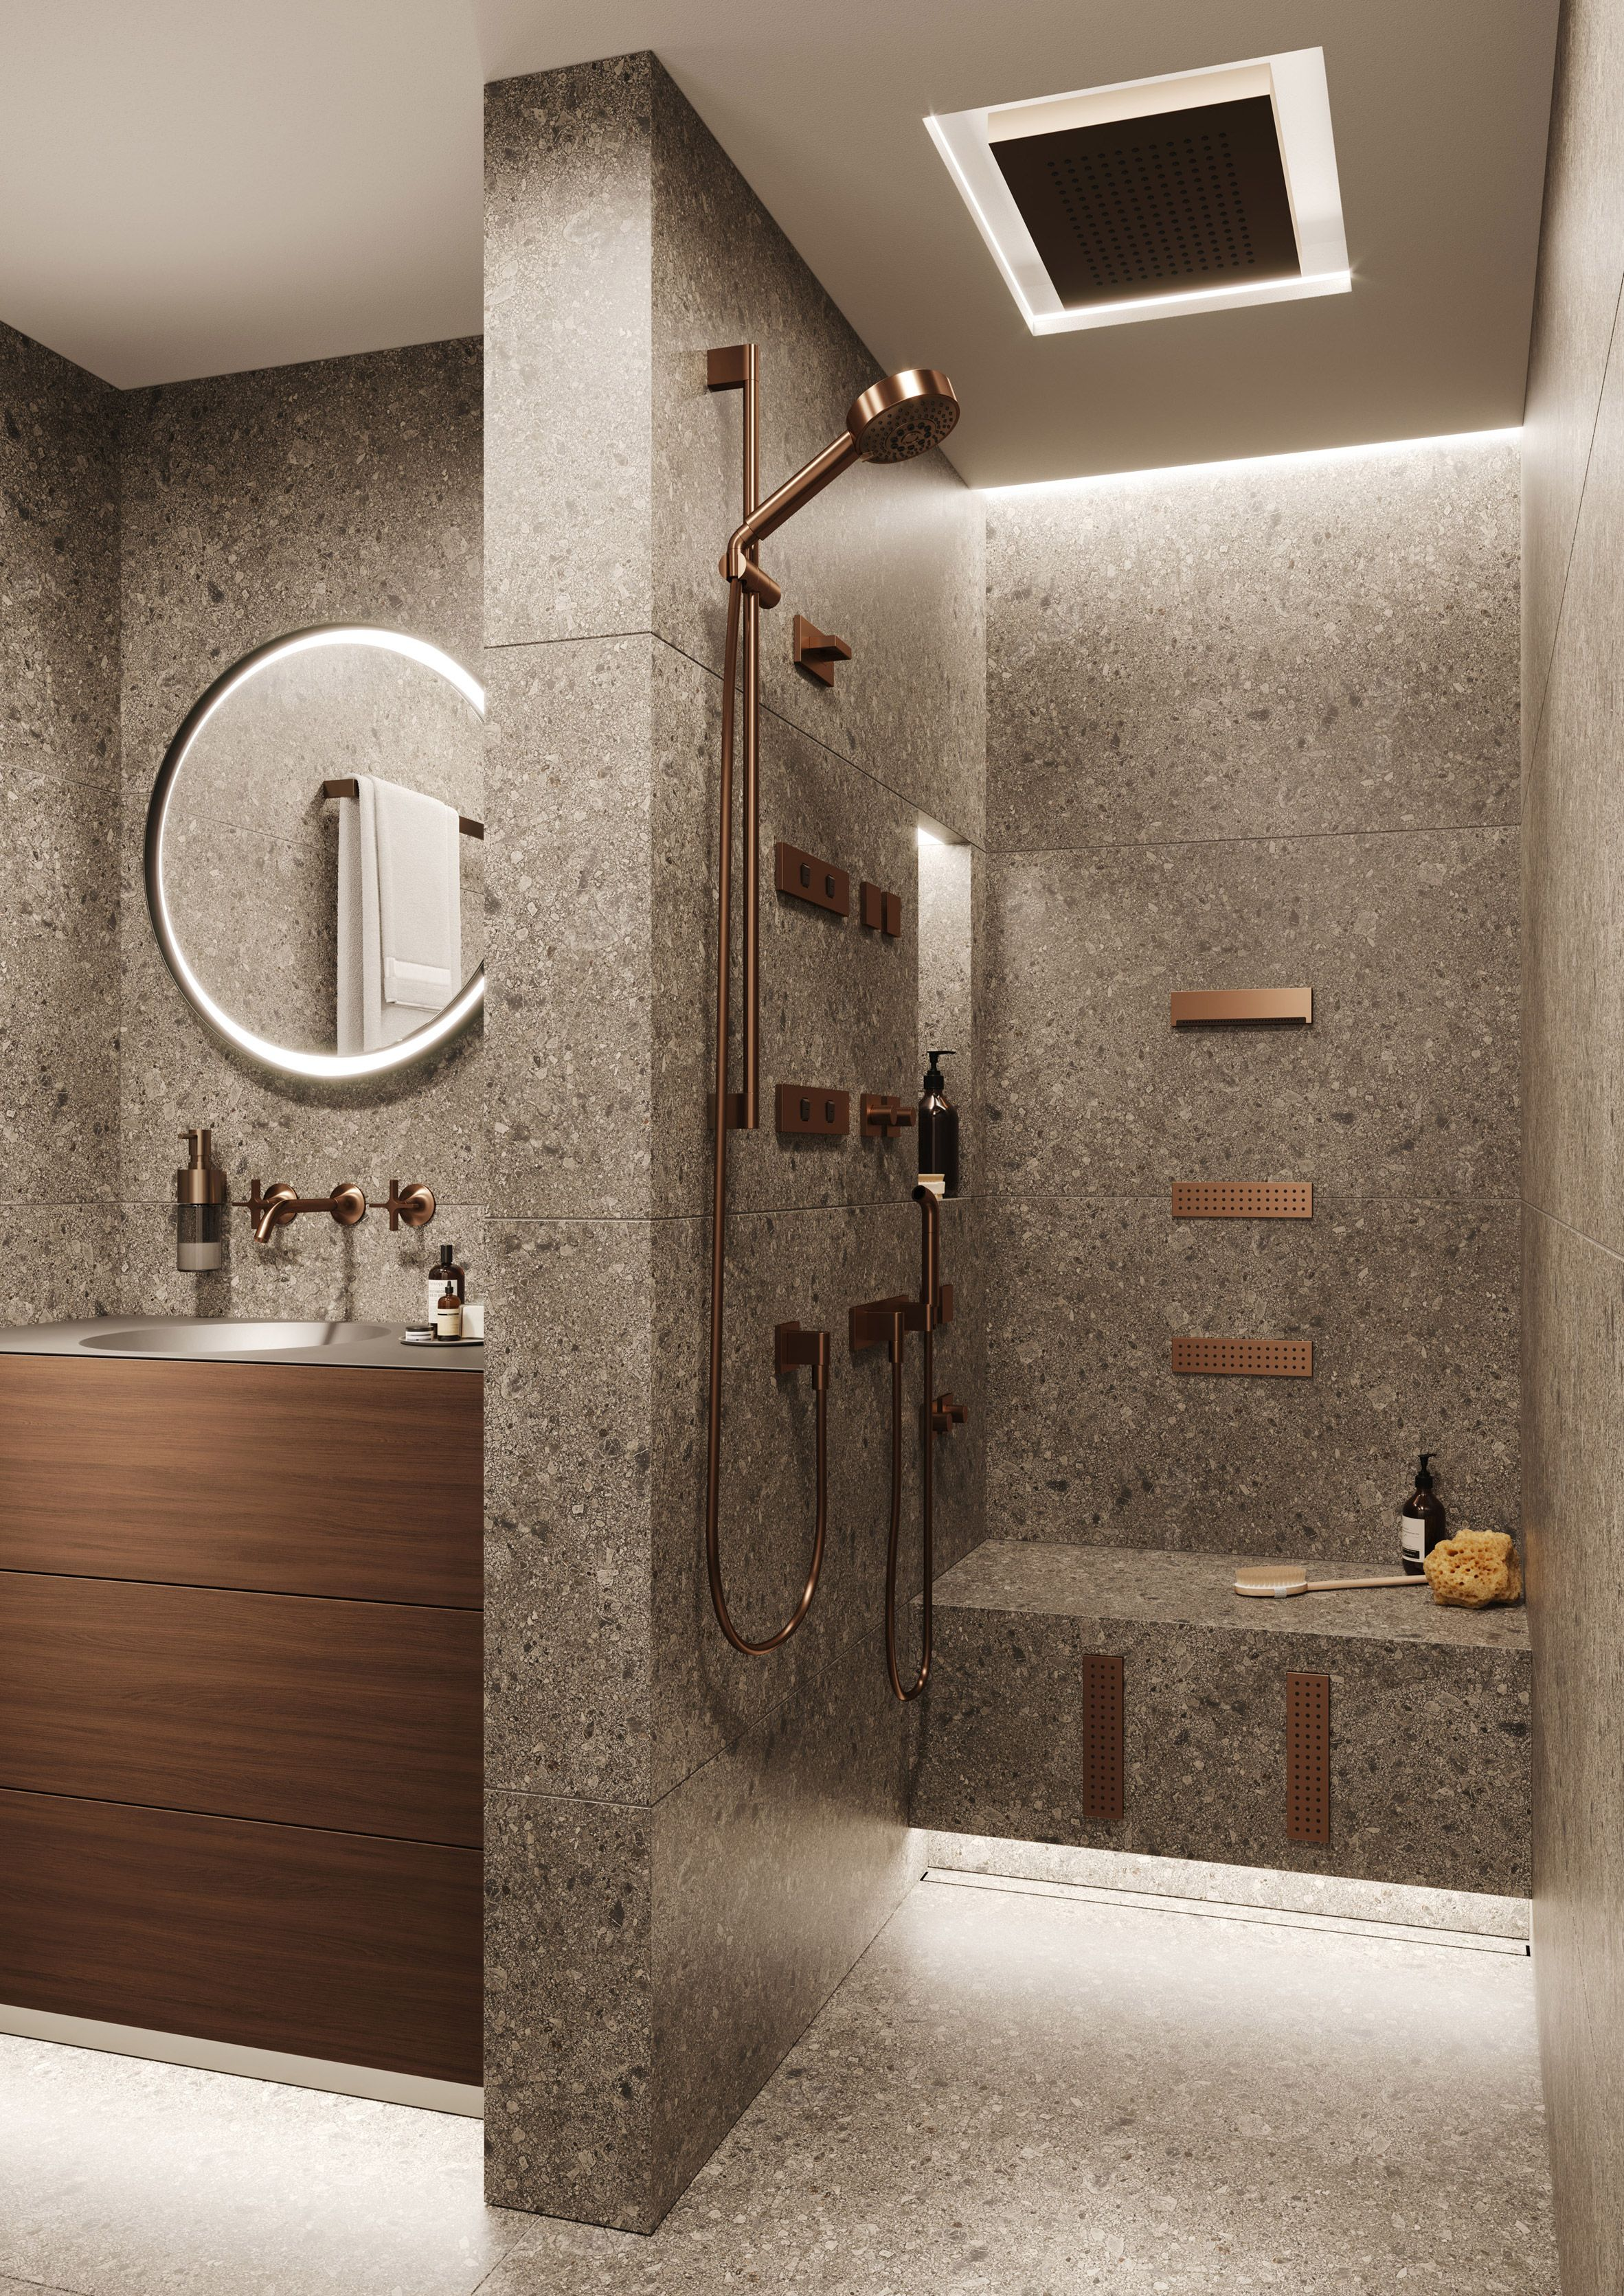 Dornbracht S Tiny Home Spa Fits Into Micro Apartments Modern Bathroom Design Small Bathroom Bathroom Interior Design